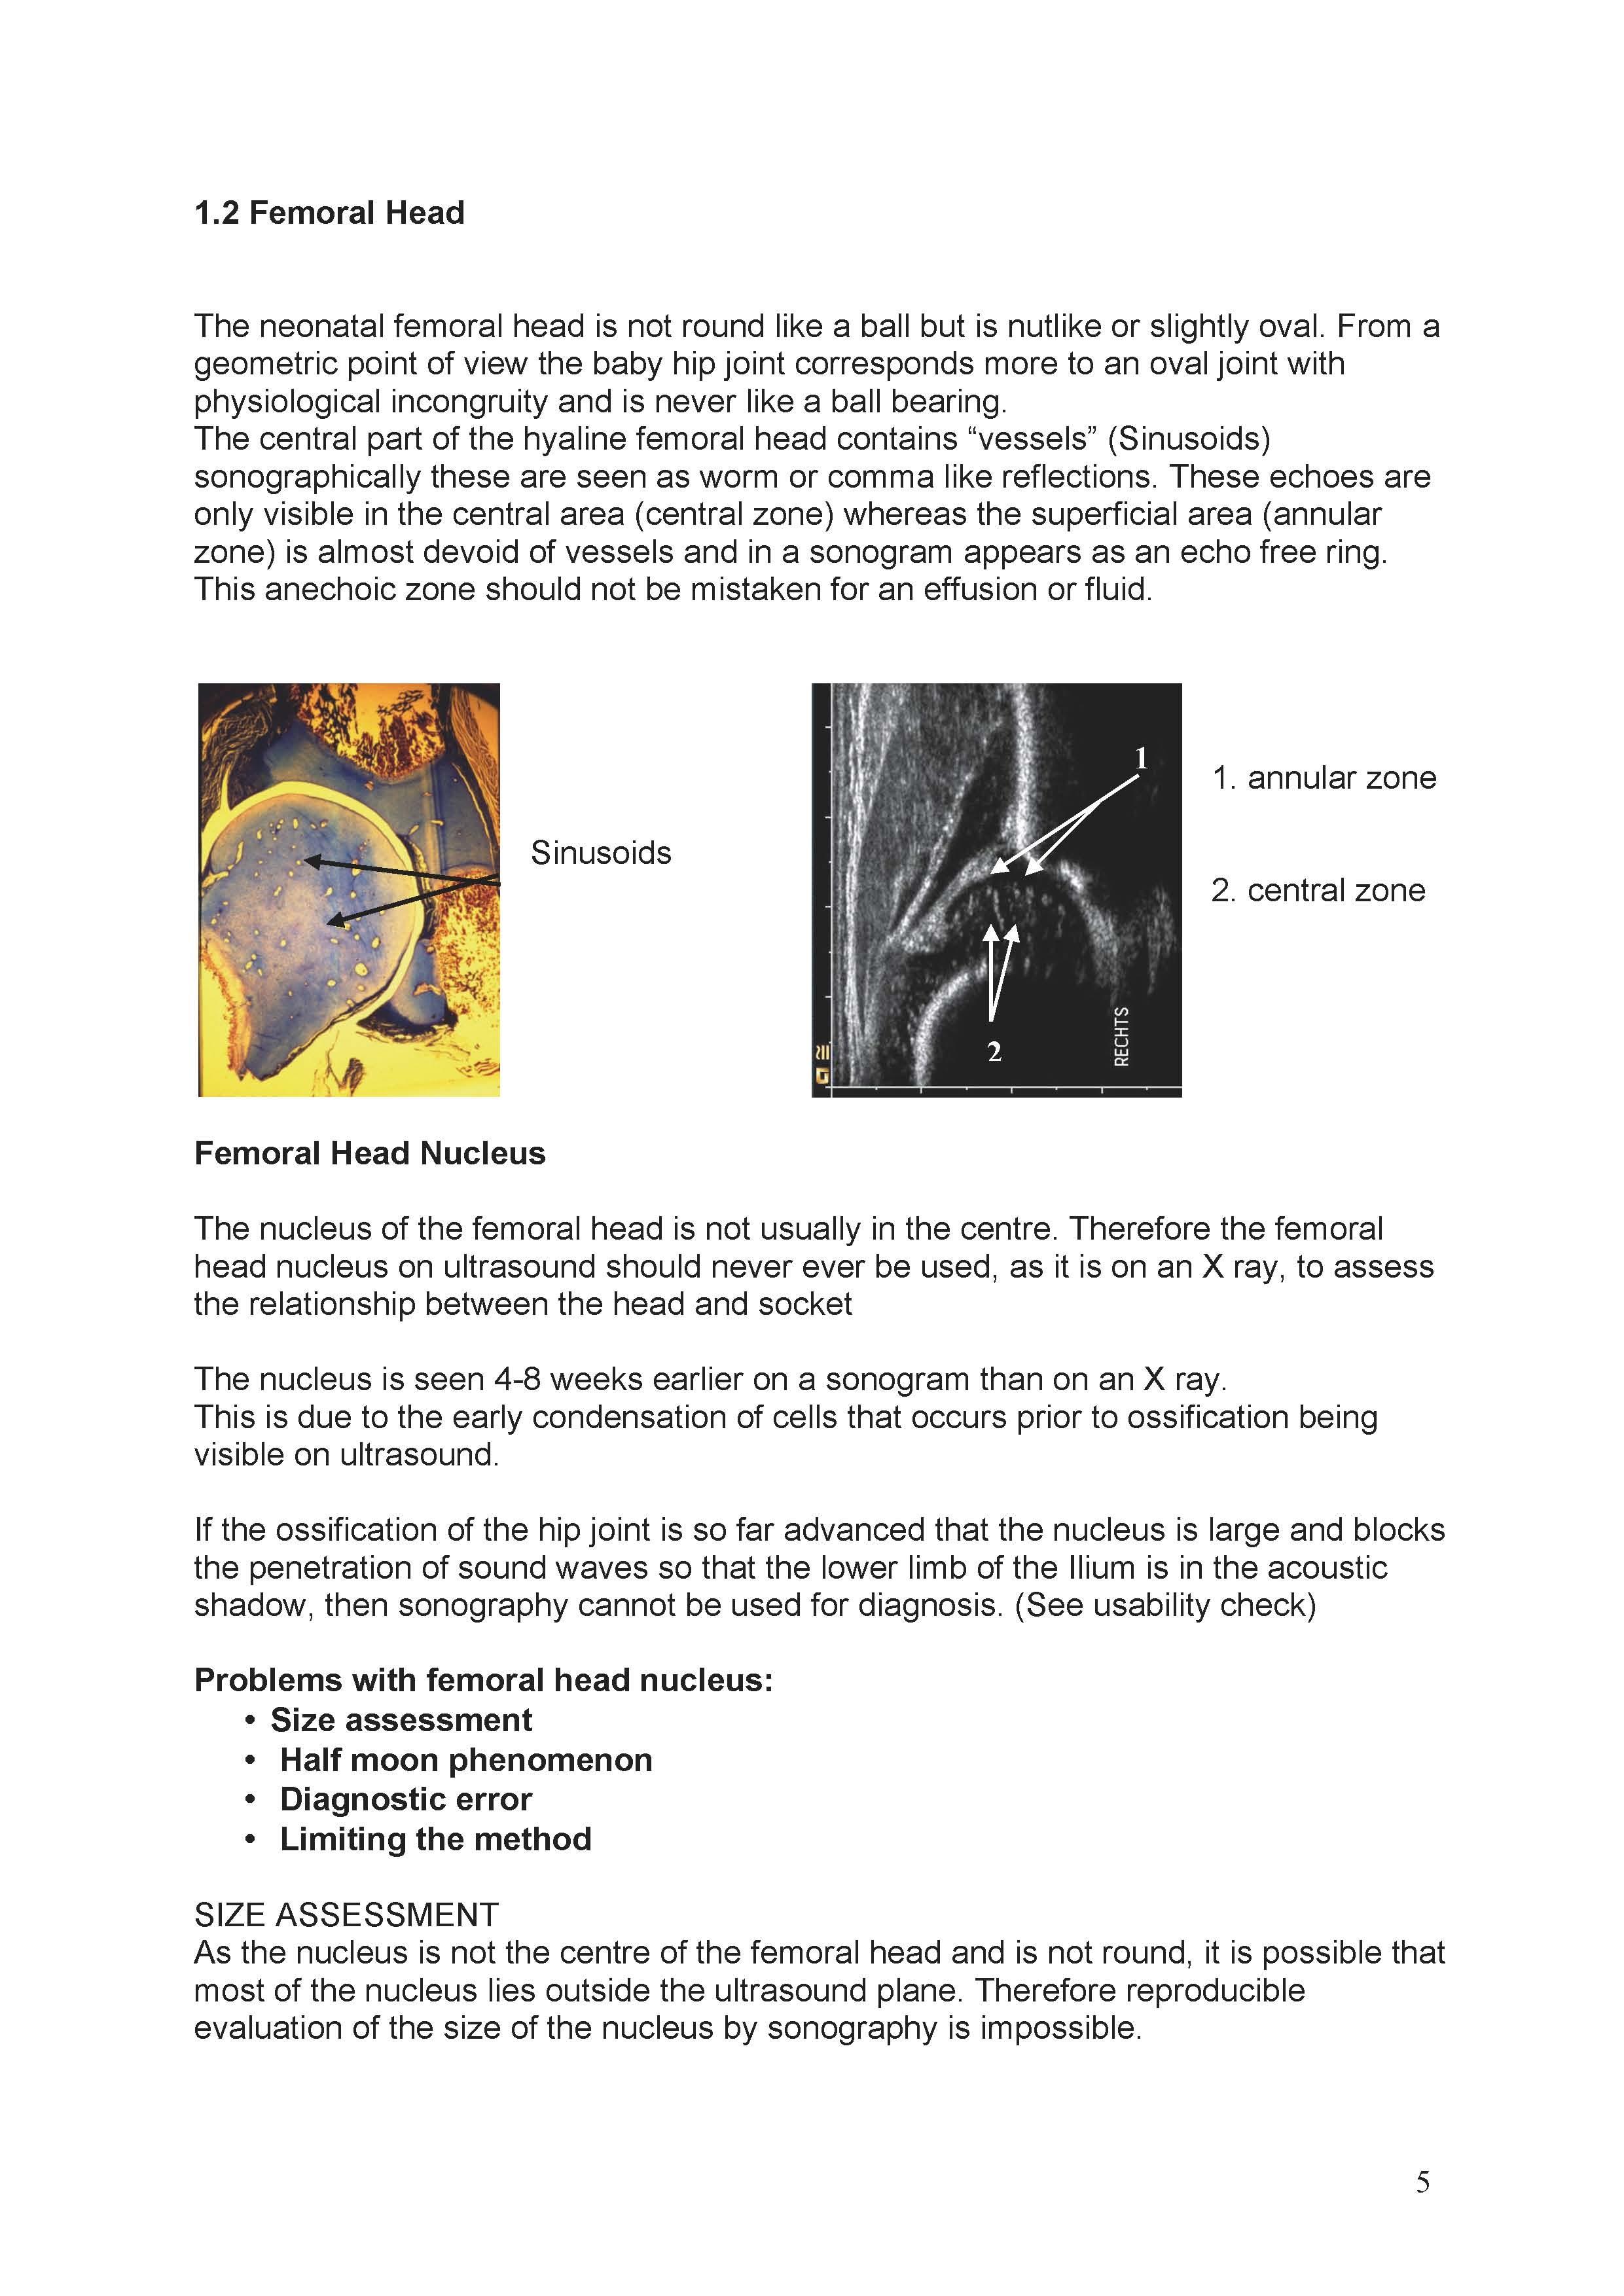 https://0501.nccdn.net/4_2/000/000/019/c2c/ManualHip-Sonography--Ma_rz-2017-1_Seite_05-2481x3508.jpg